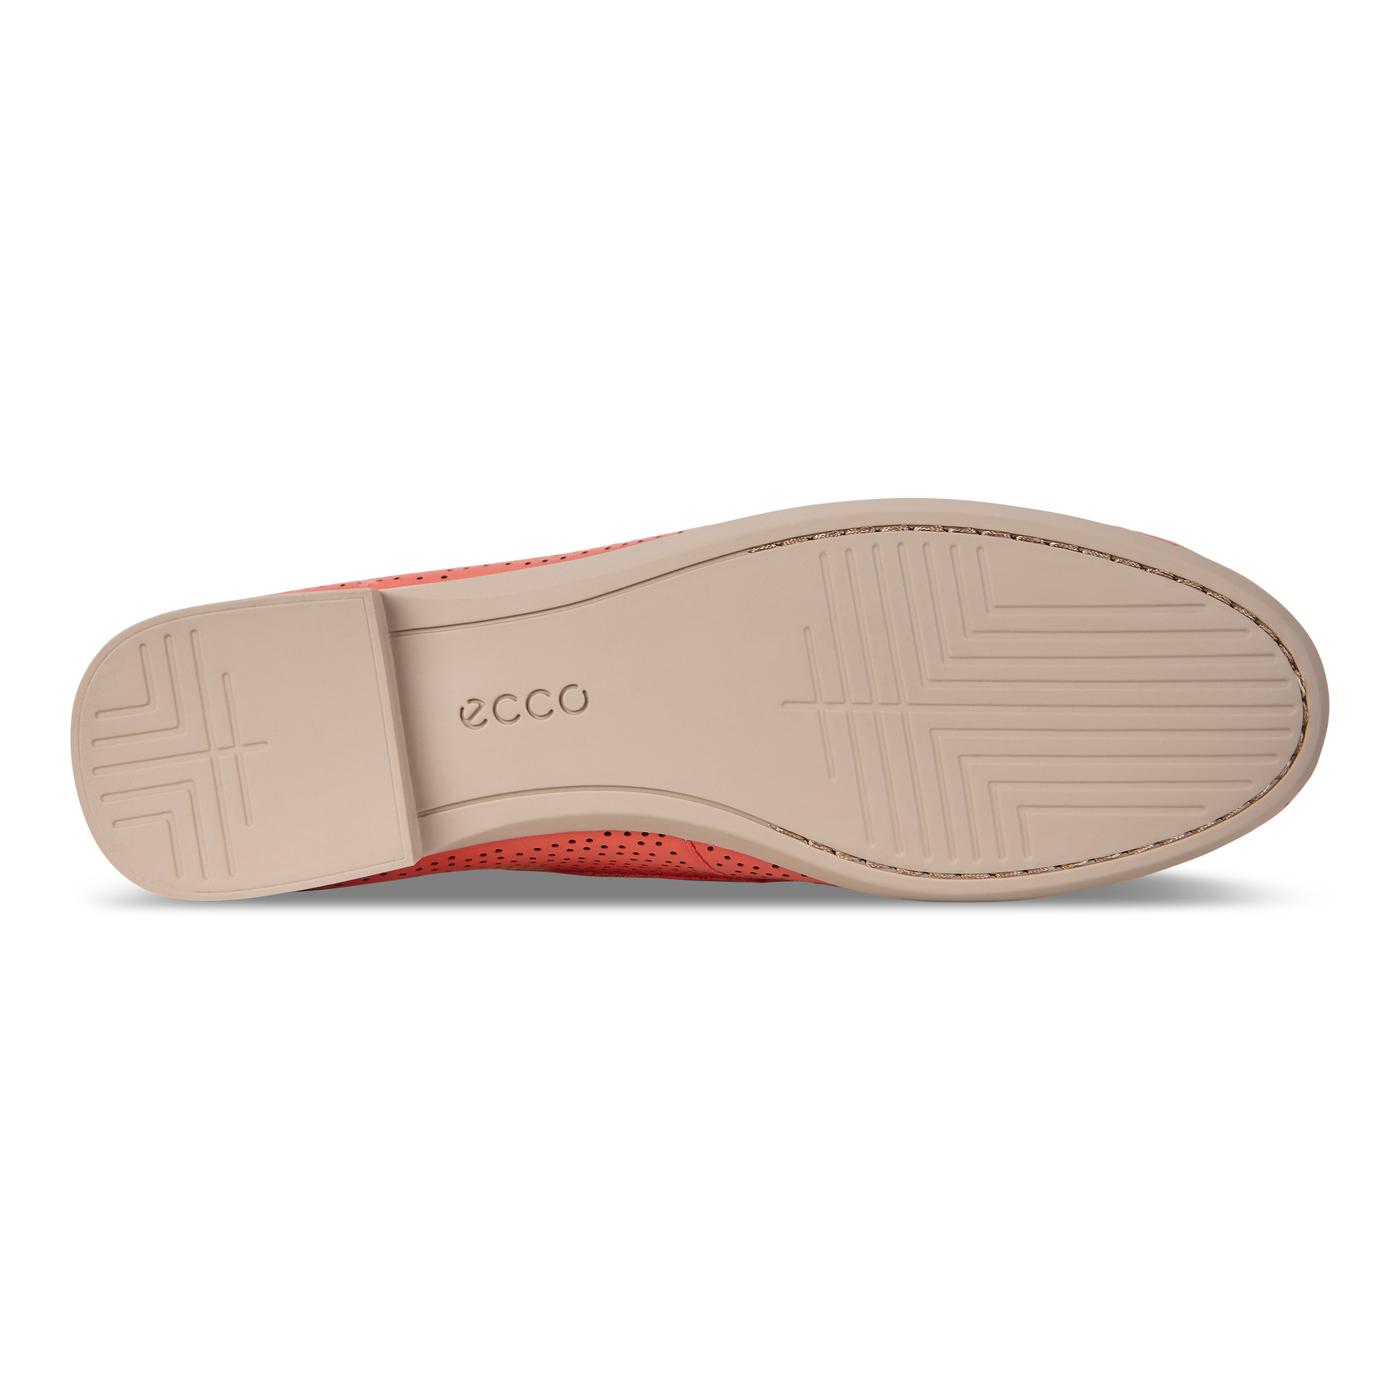 ECCO BARI MOC Moccasin Slip-on